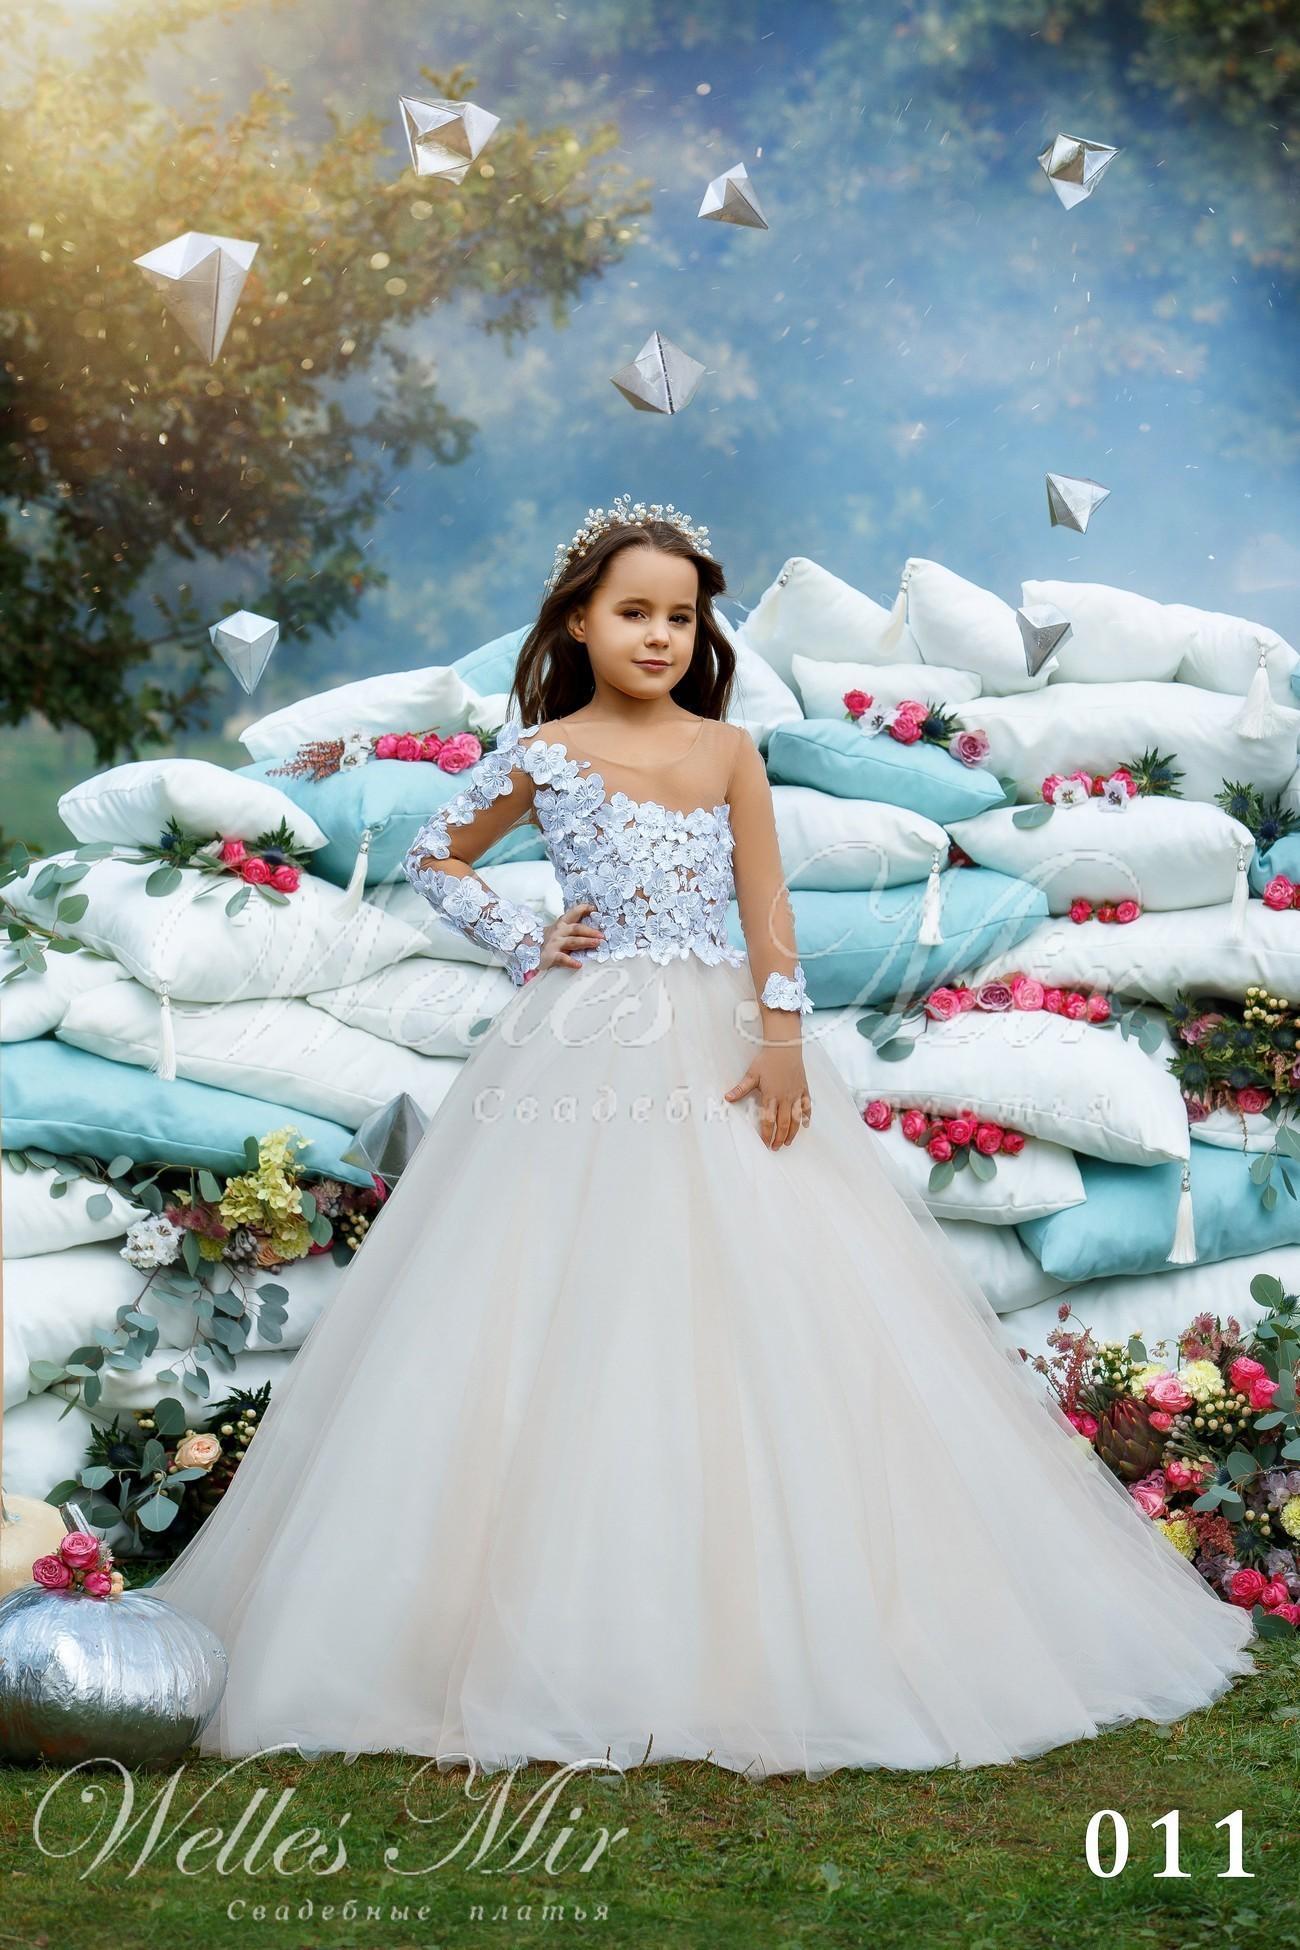 Дитячі сукні Kids Deluxe Collection 2018 - 011